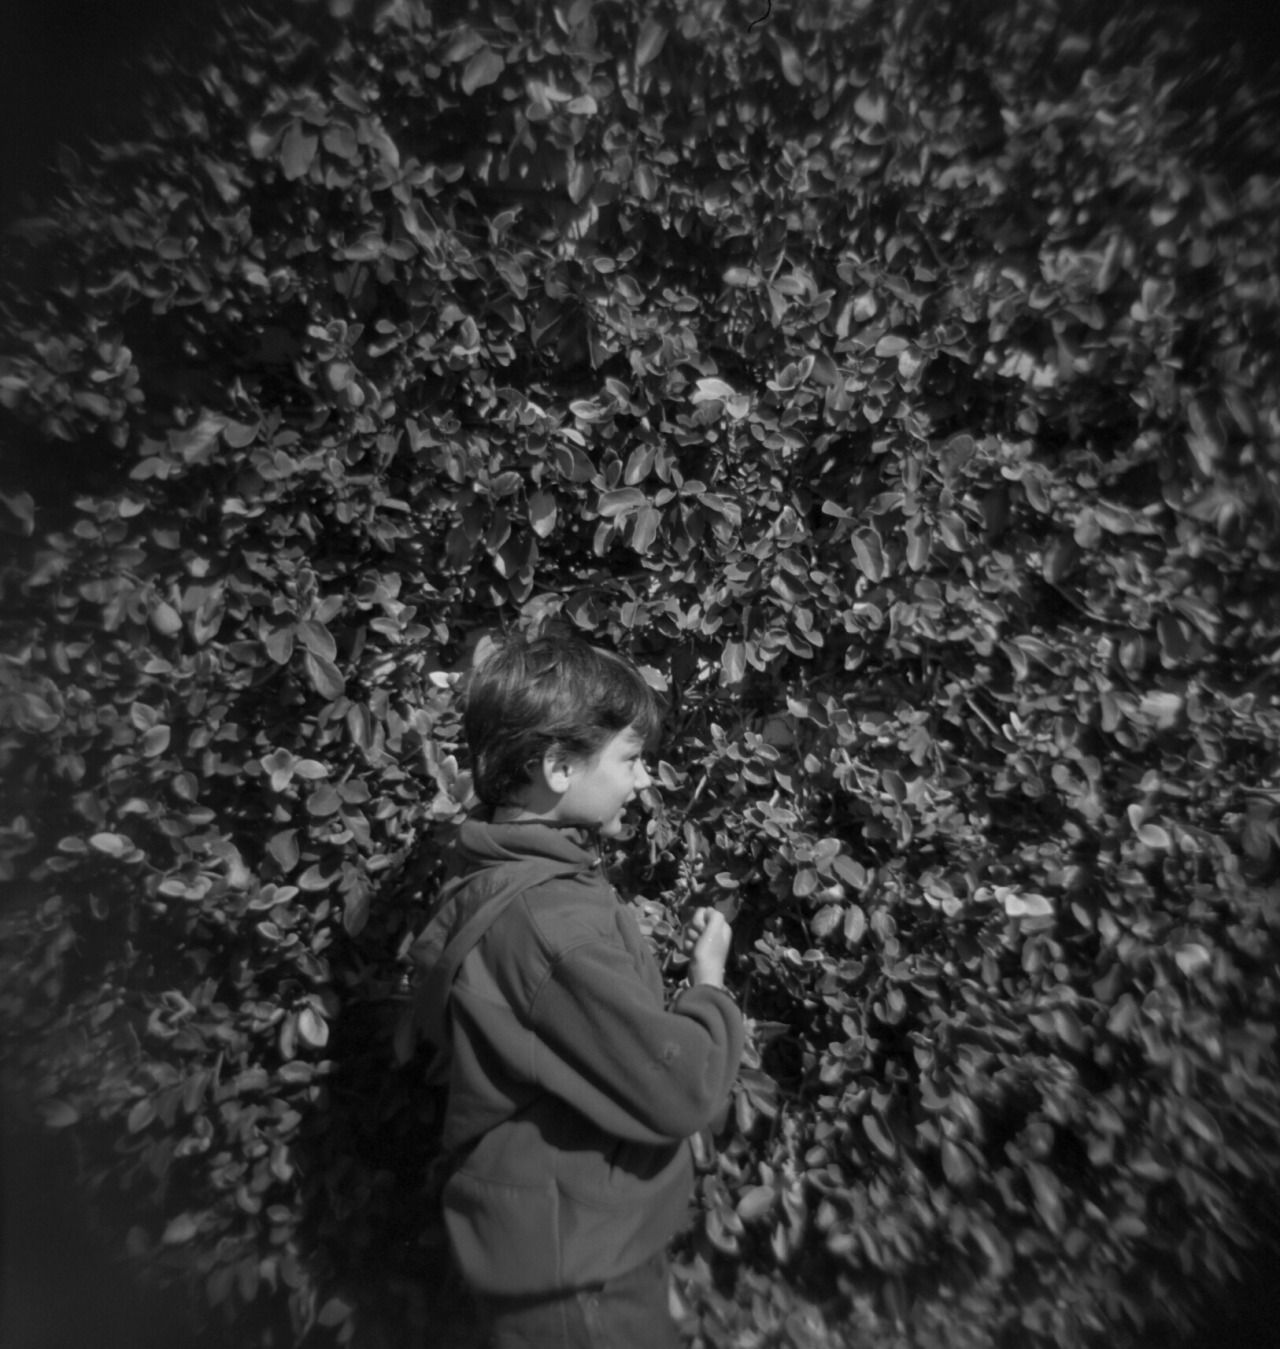 Xander Brody  |  Los Angeles Natural History Museum  |  Feb 2013    Holga - Tri X